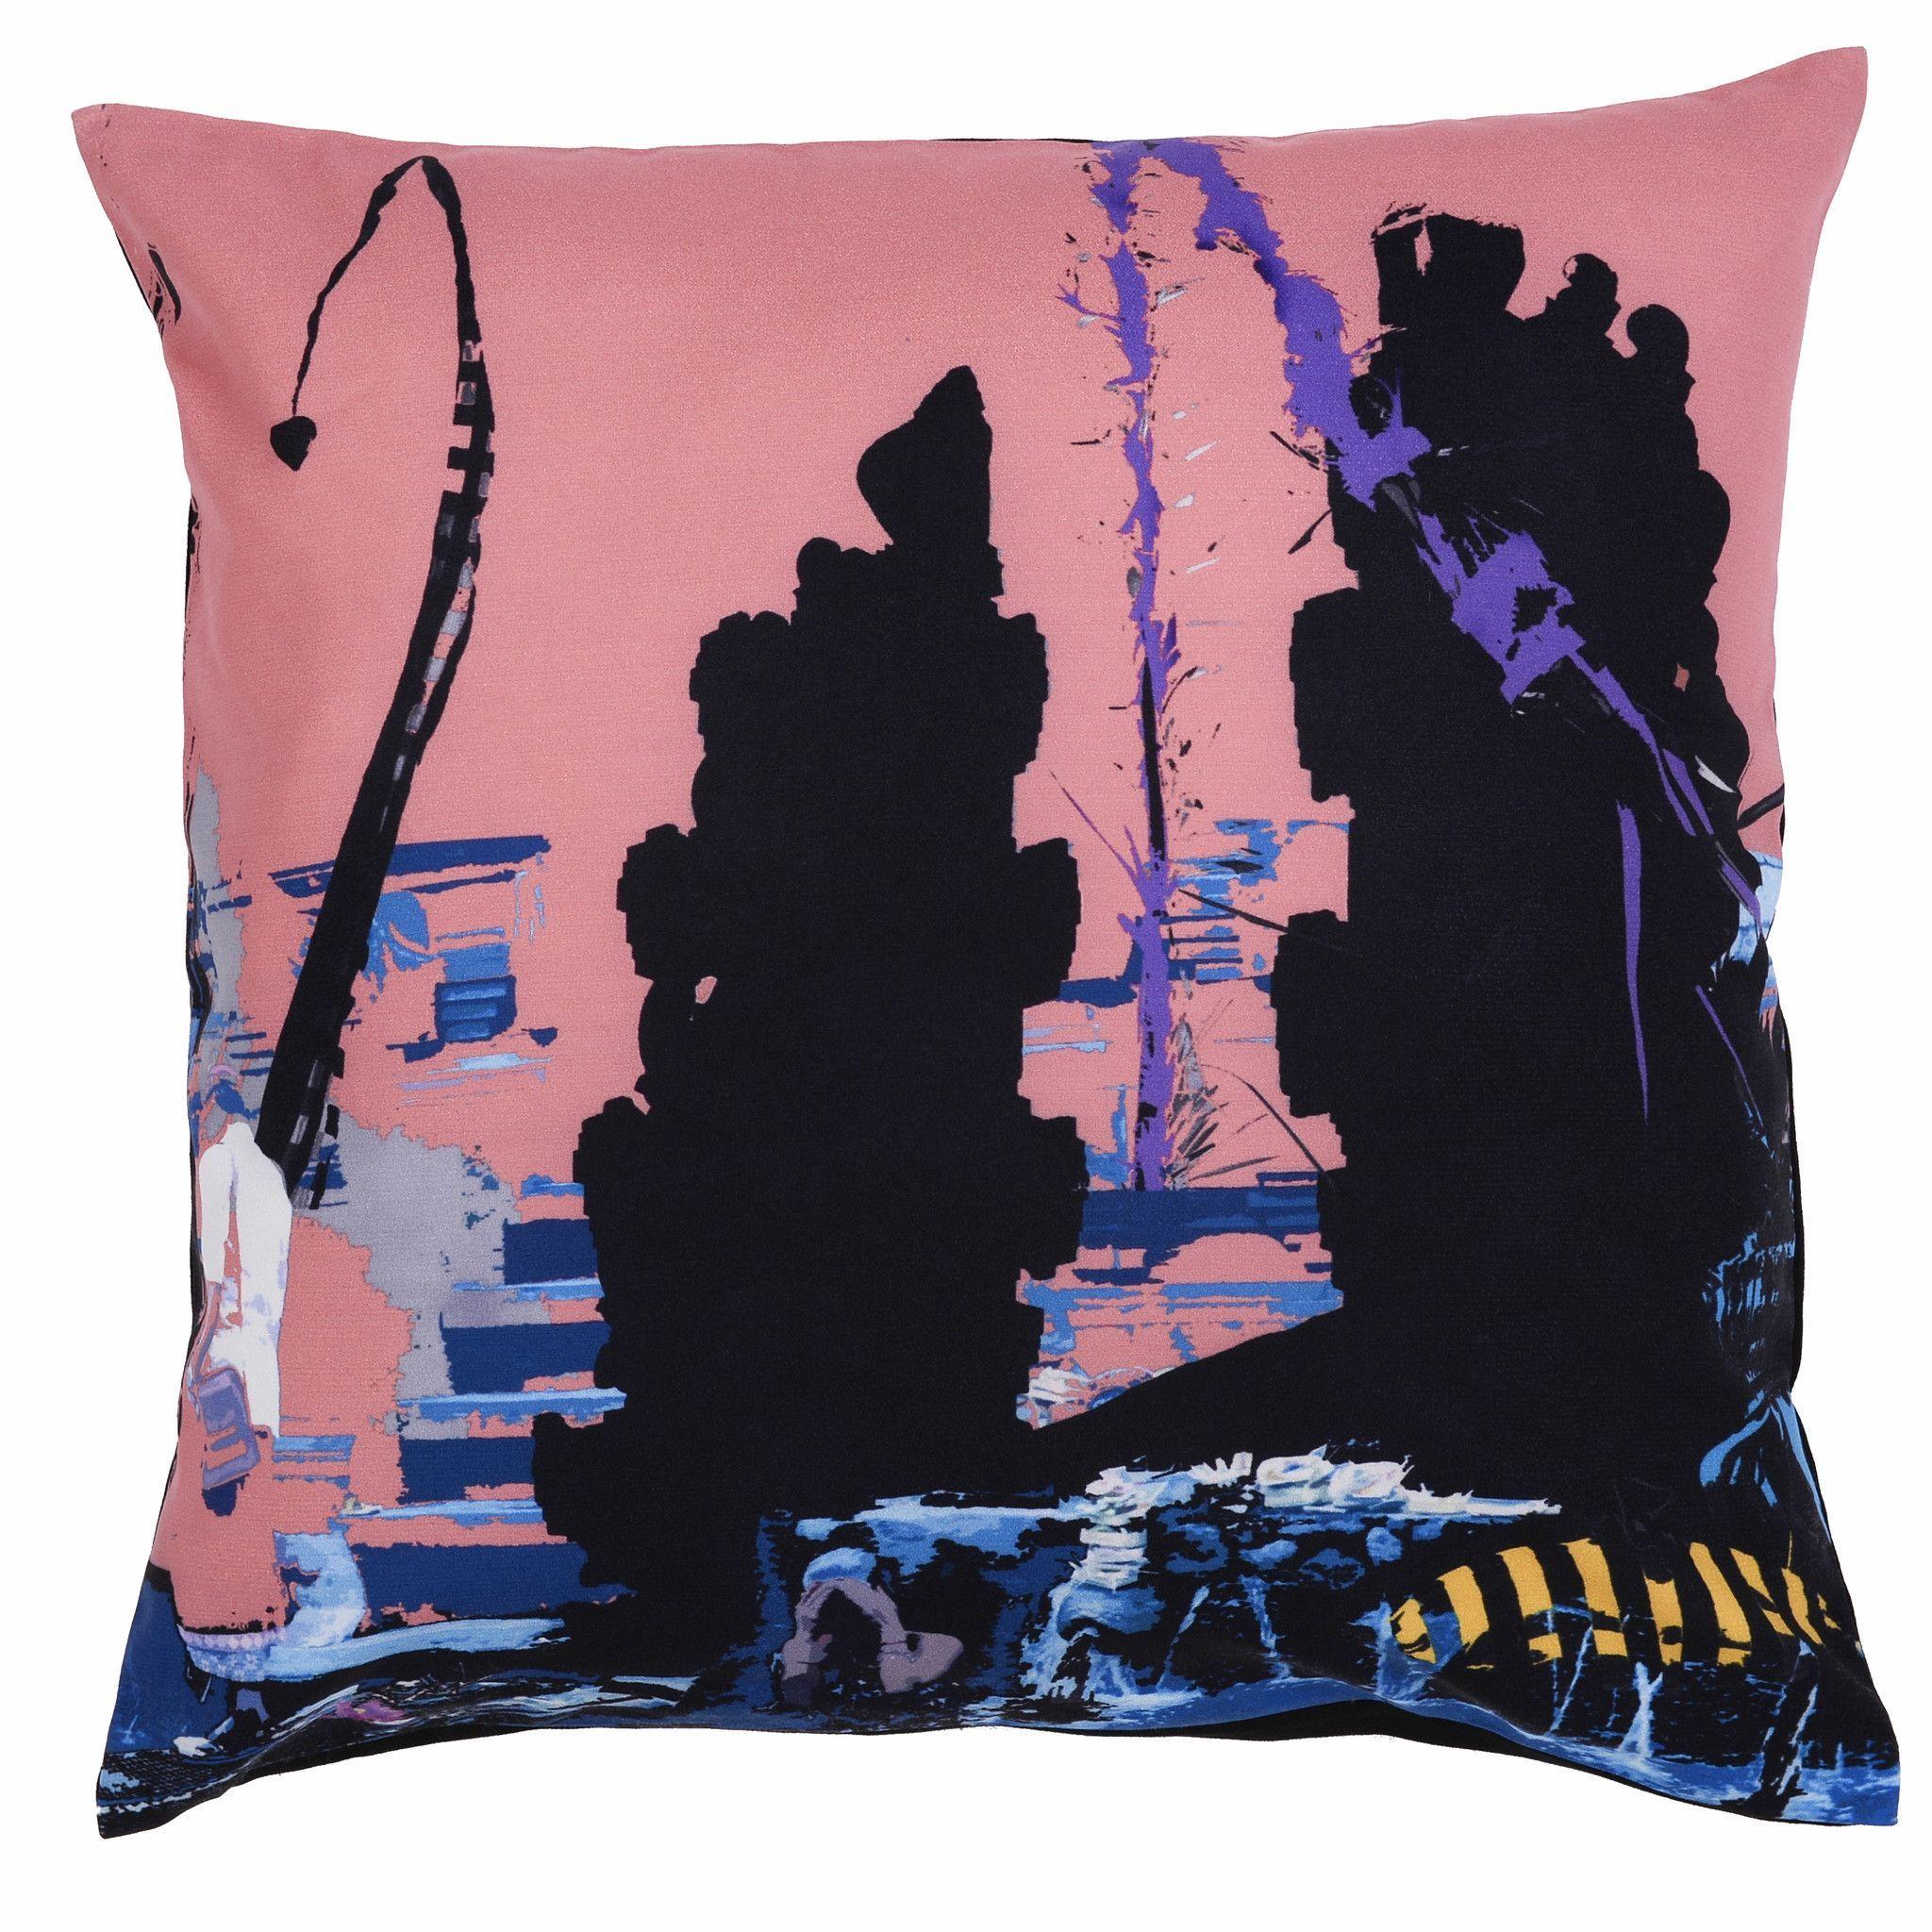 Falling water cushion cover